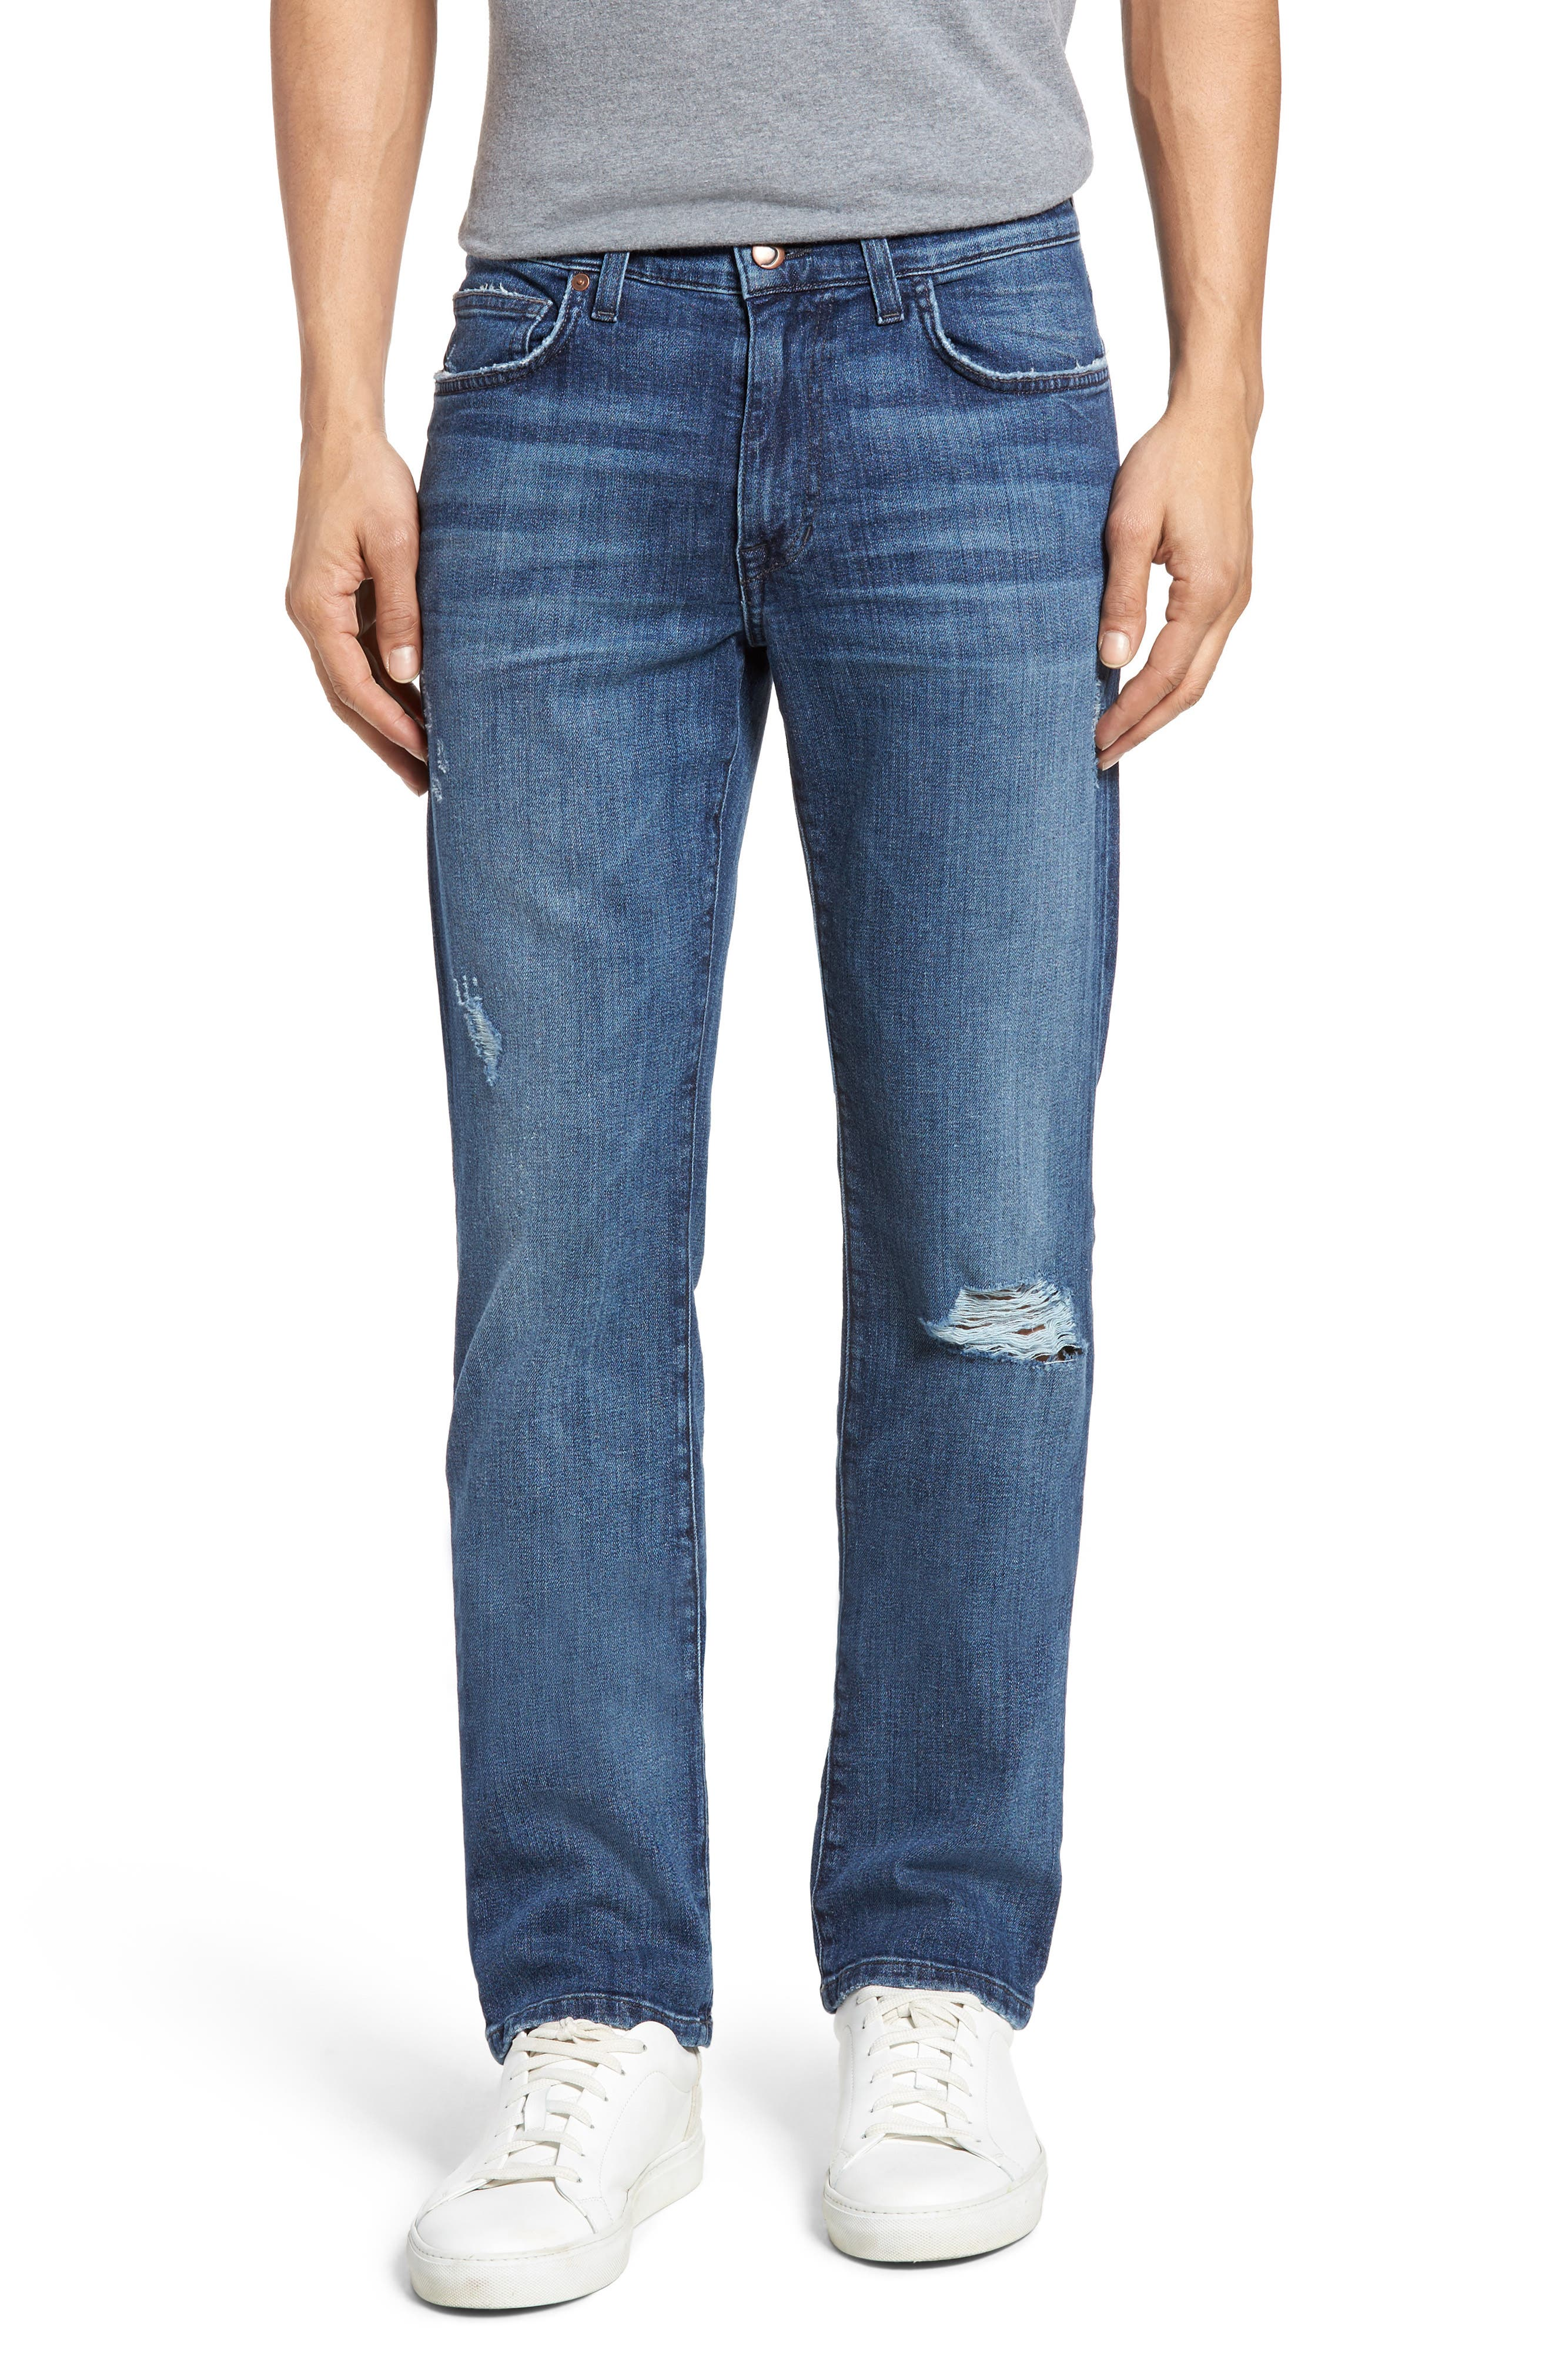 Brixton Slim Straight Leg Jeans,                             Main thumbnail 1, color,                             410